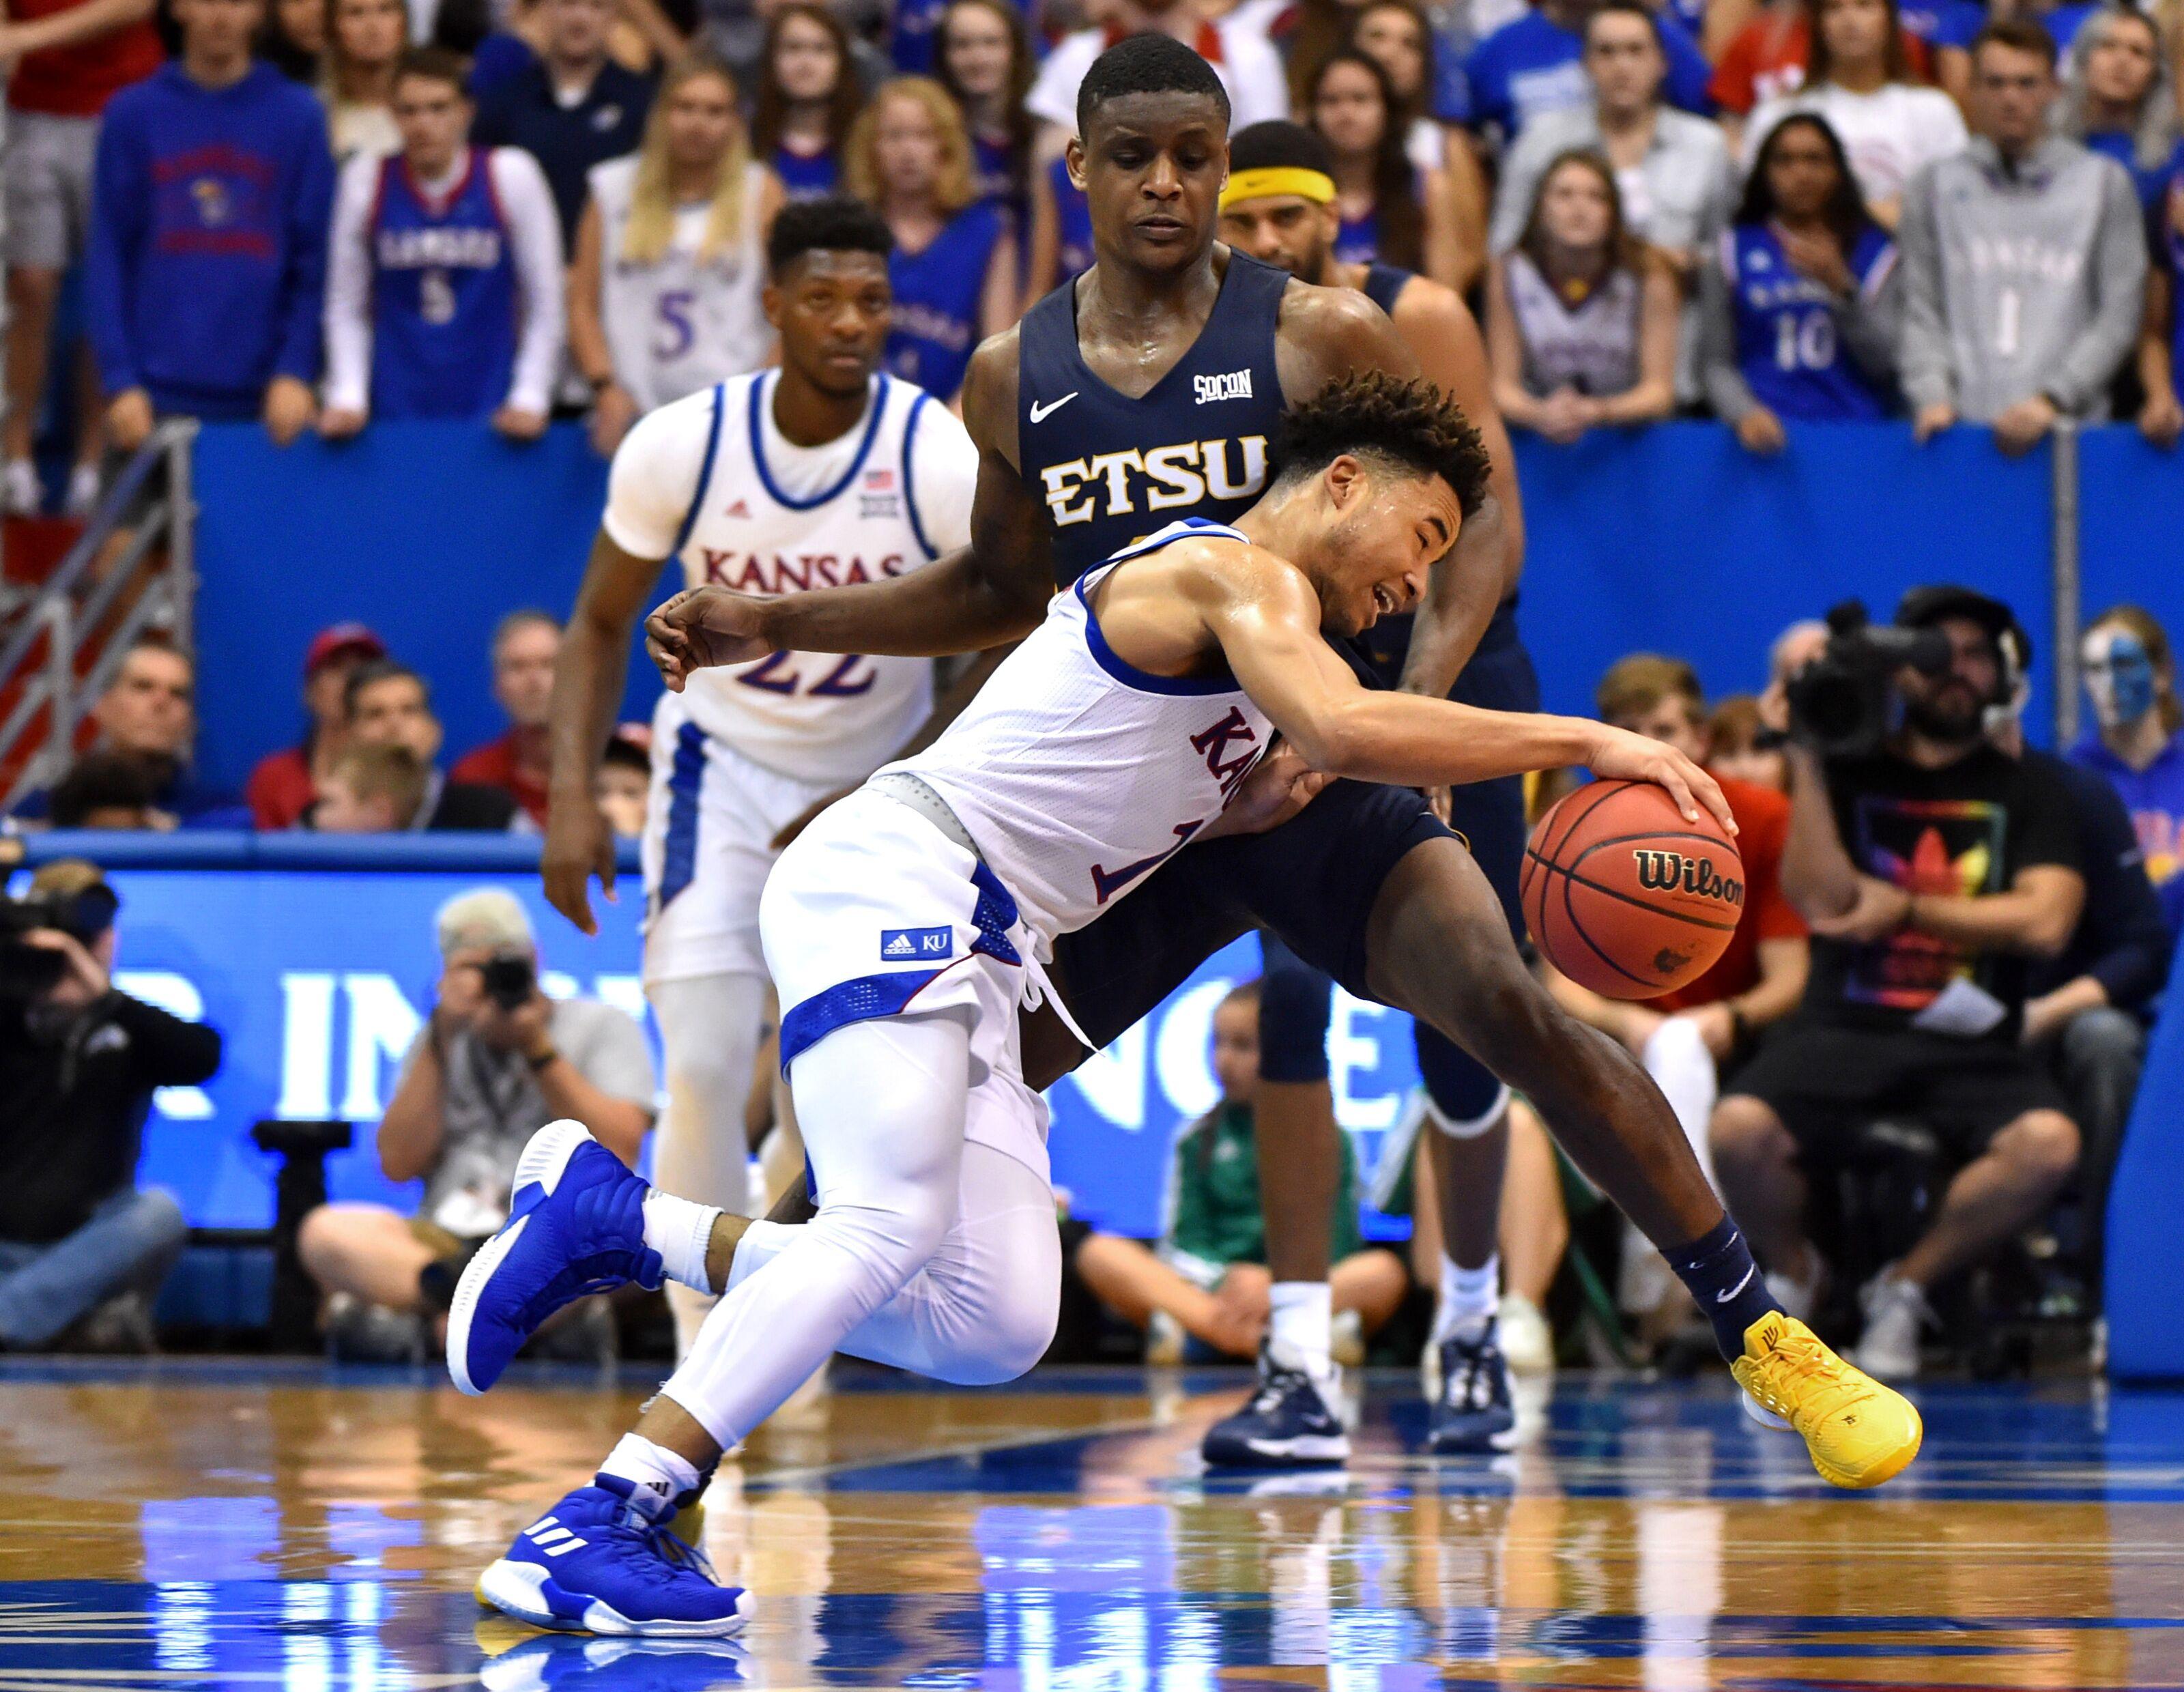 Kansas basketball: Lack of threes vs. ETSU isn't cause for ...